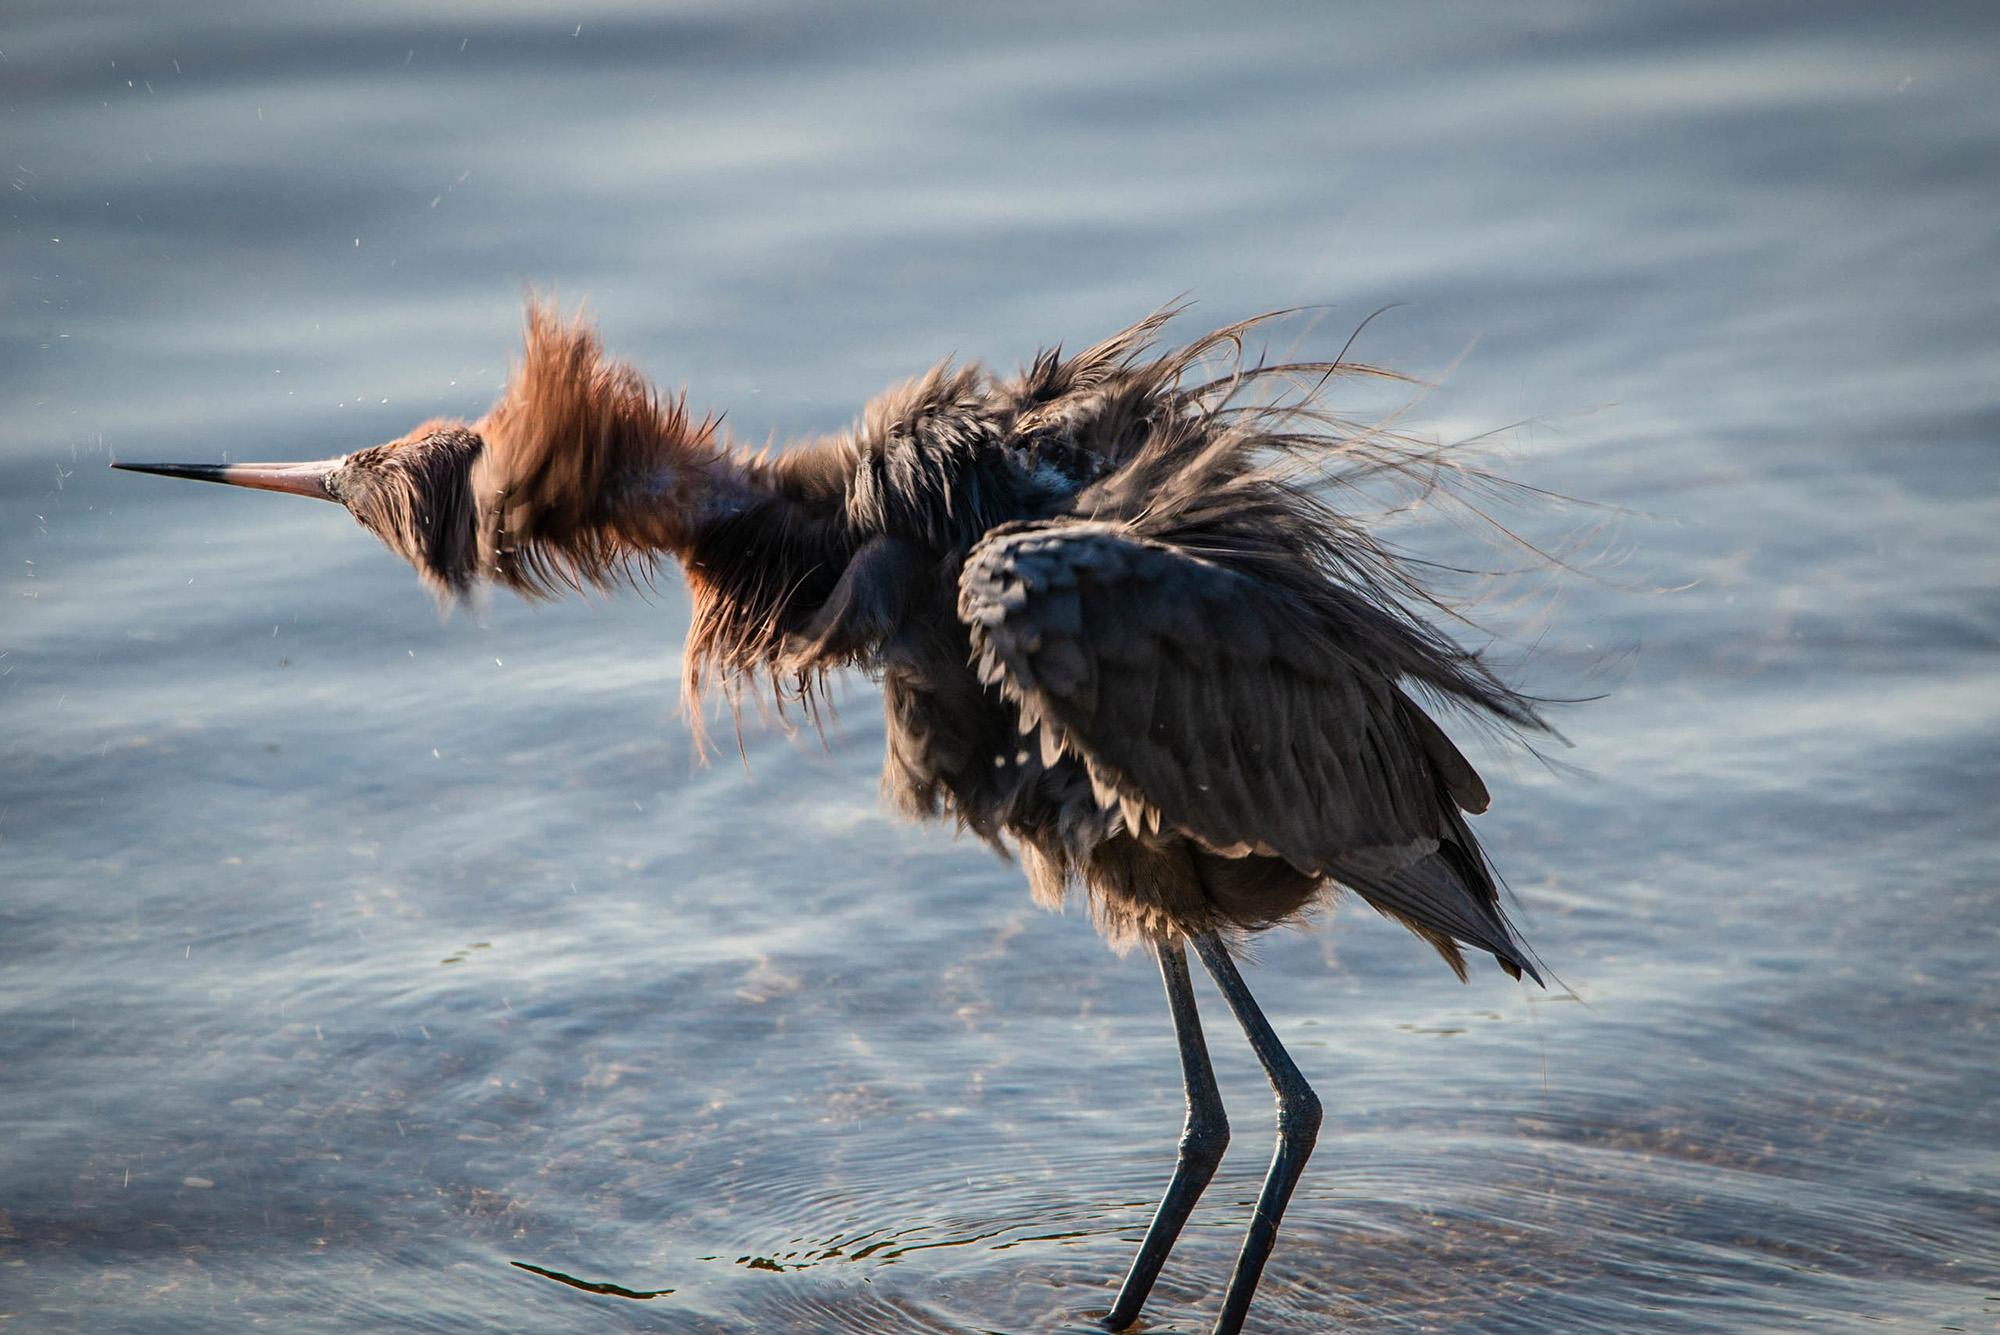 #reddishegret, #sanibel, #dingdarling, #sanibelisland, #florida, #heron, #wadingbird, #nikon, #tamron, #birdphotography, #wildlife